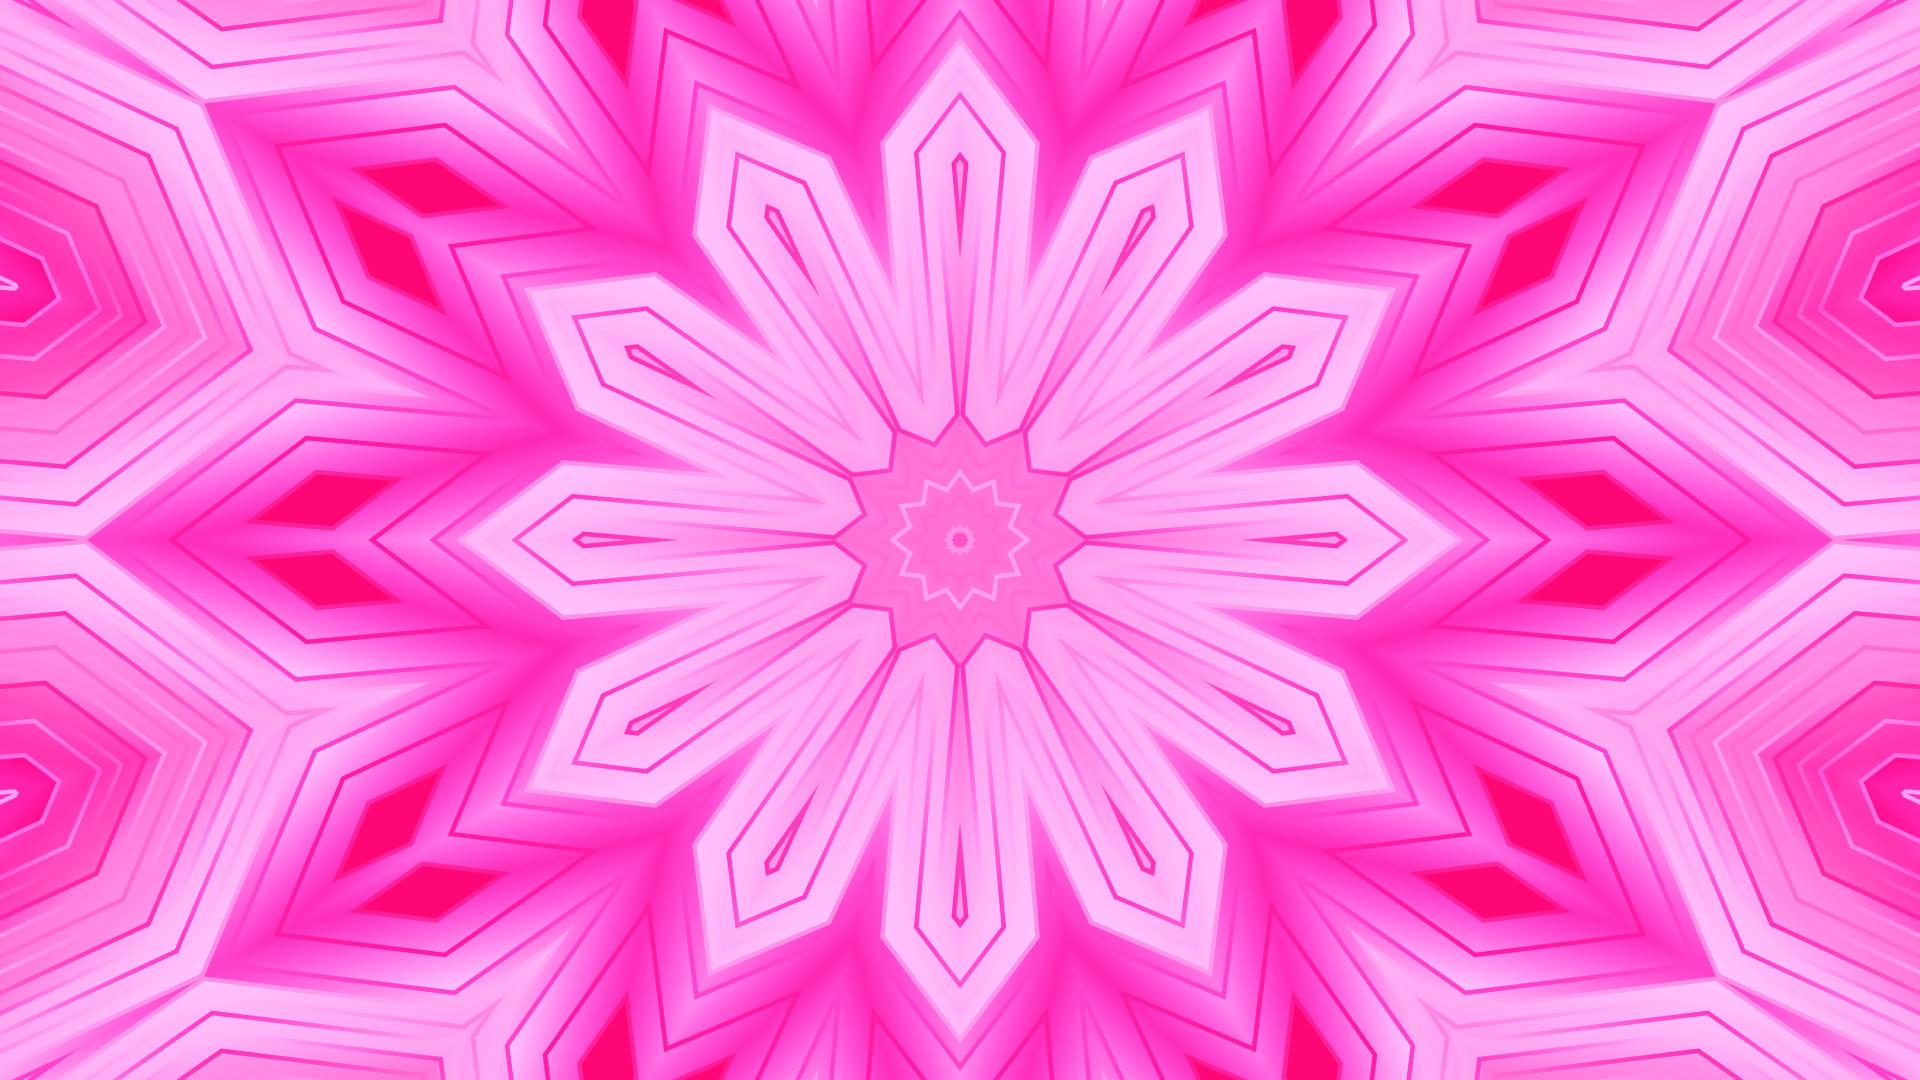 Artistic Digital Art Pattern Shapes Pink Gradient 1920x1080